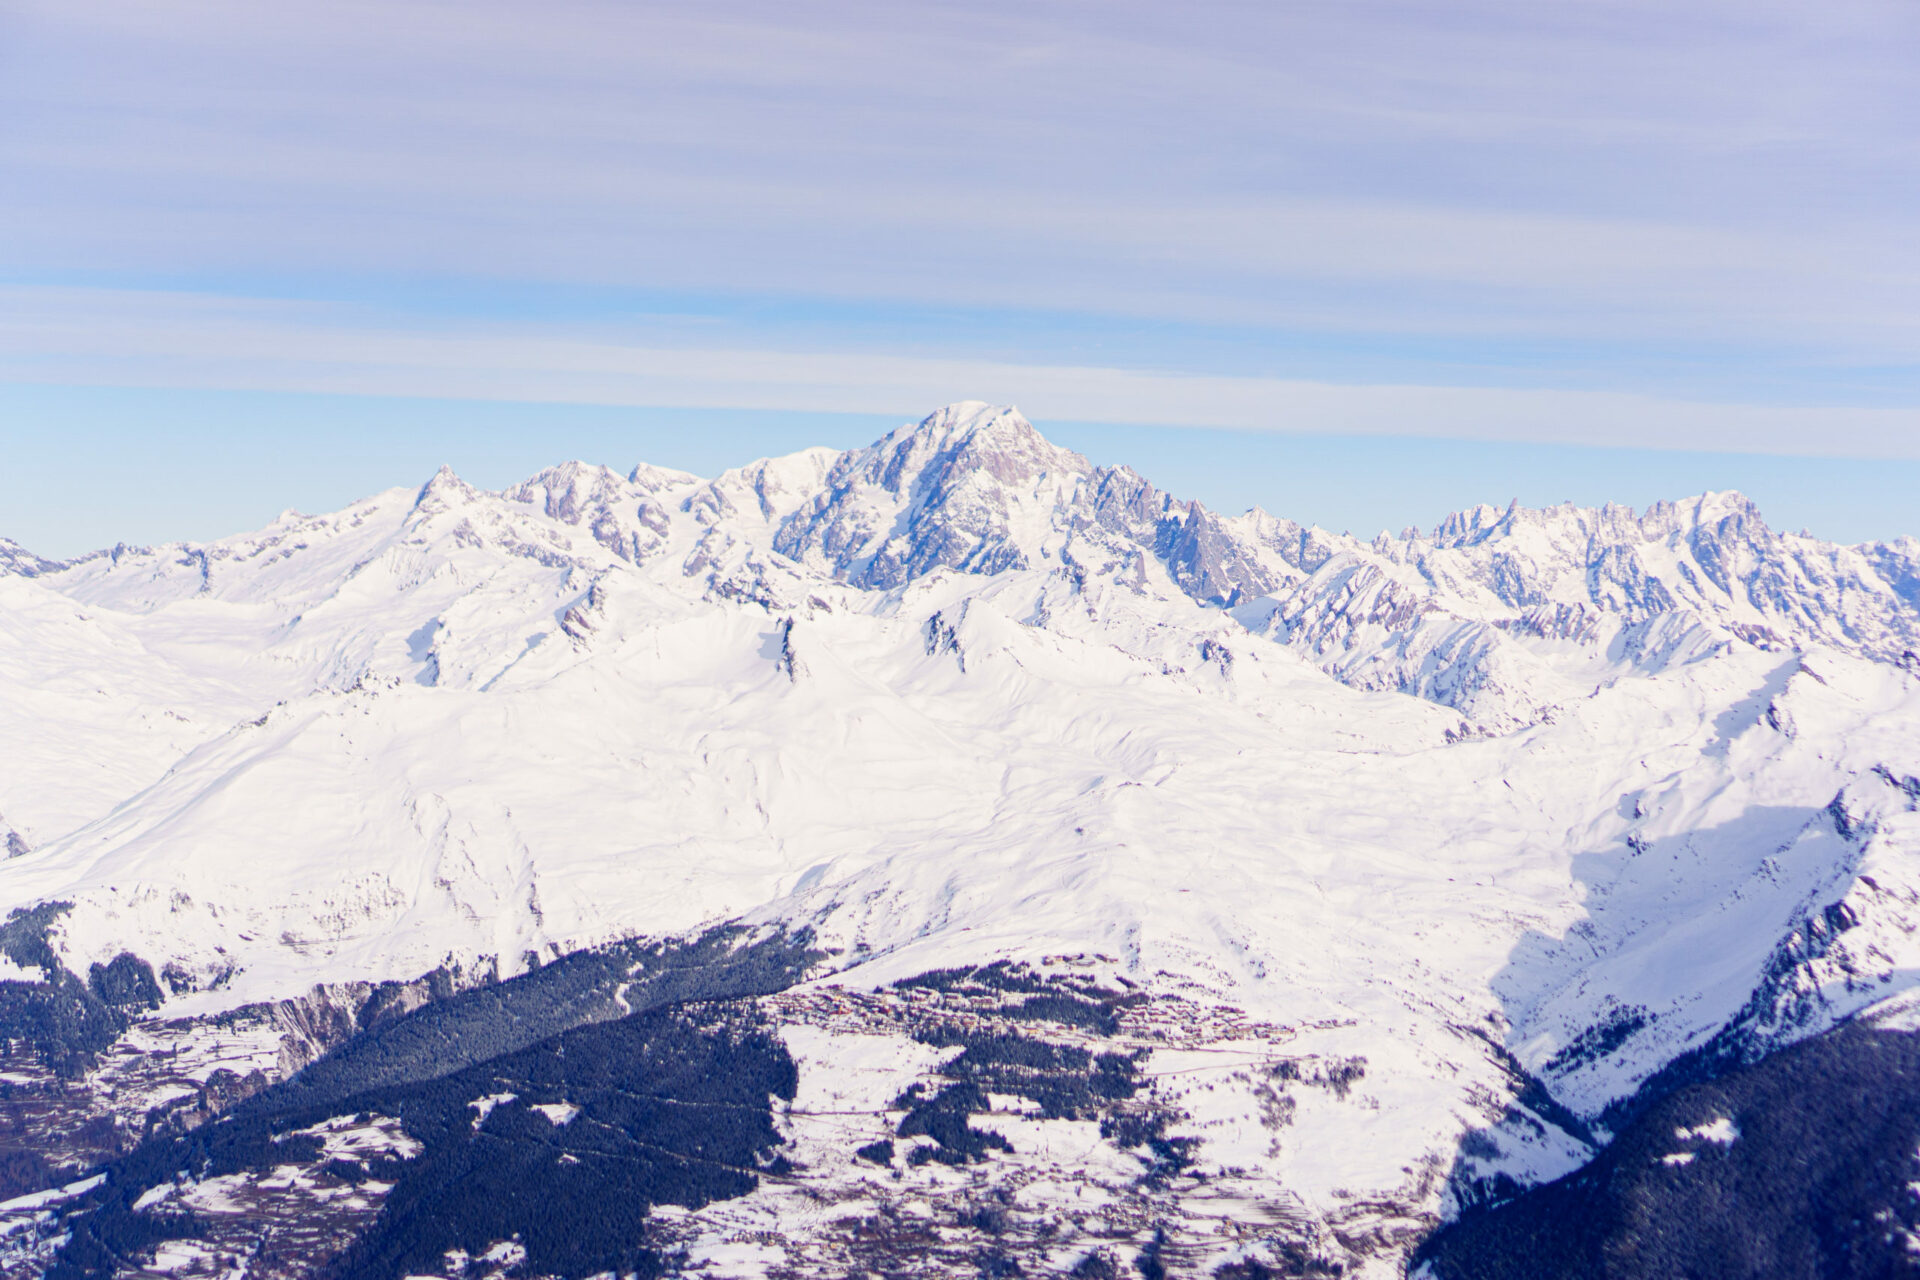 Les Arcs, France, a ecofriendly destination